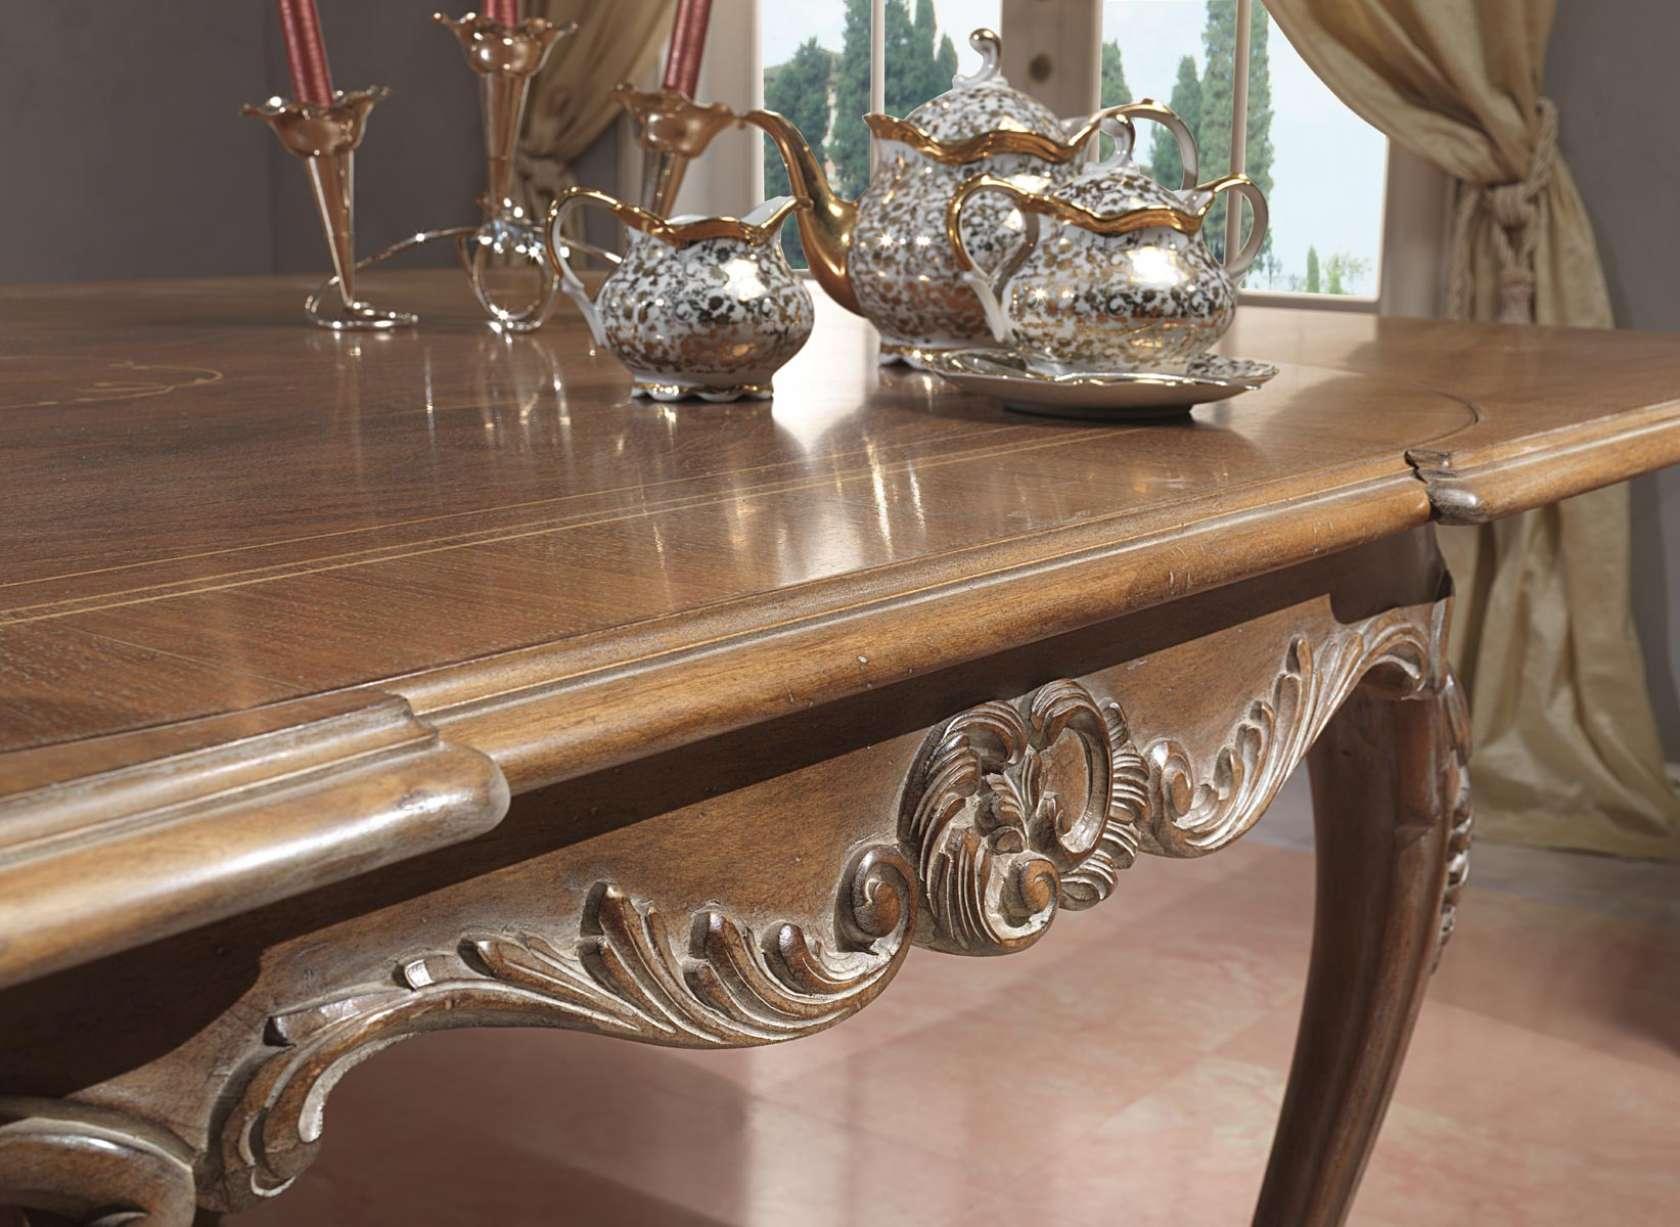 Louis xv dining table - Louis Xv Dining Table